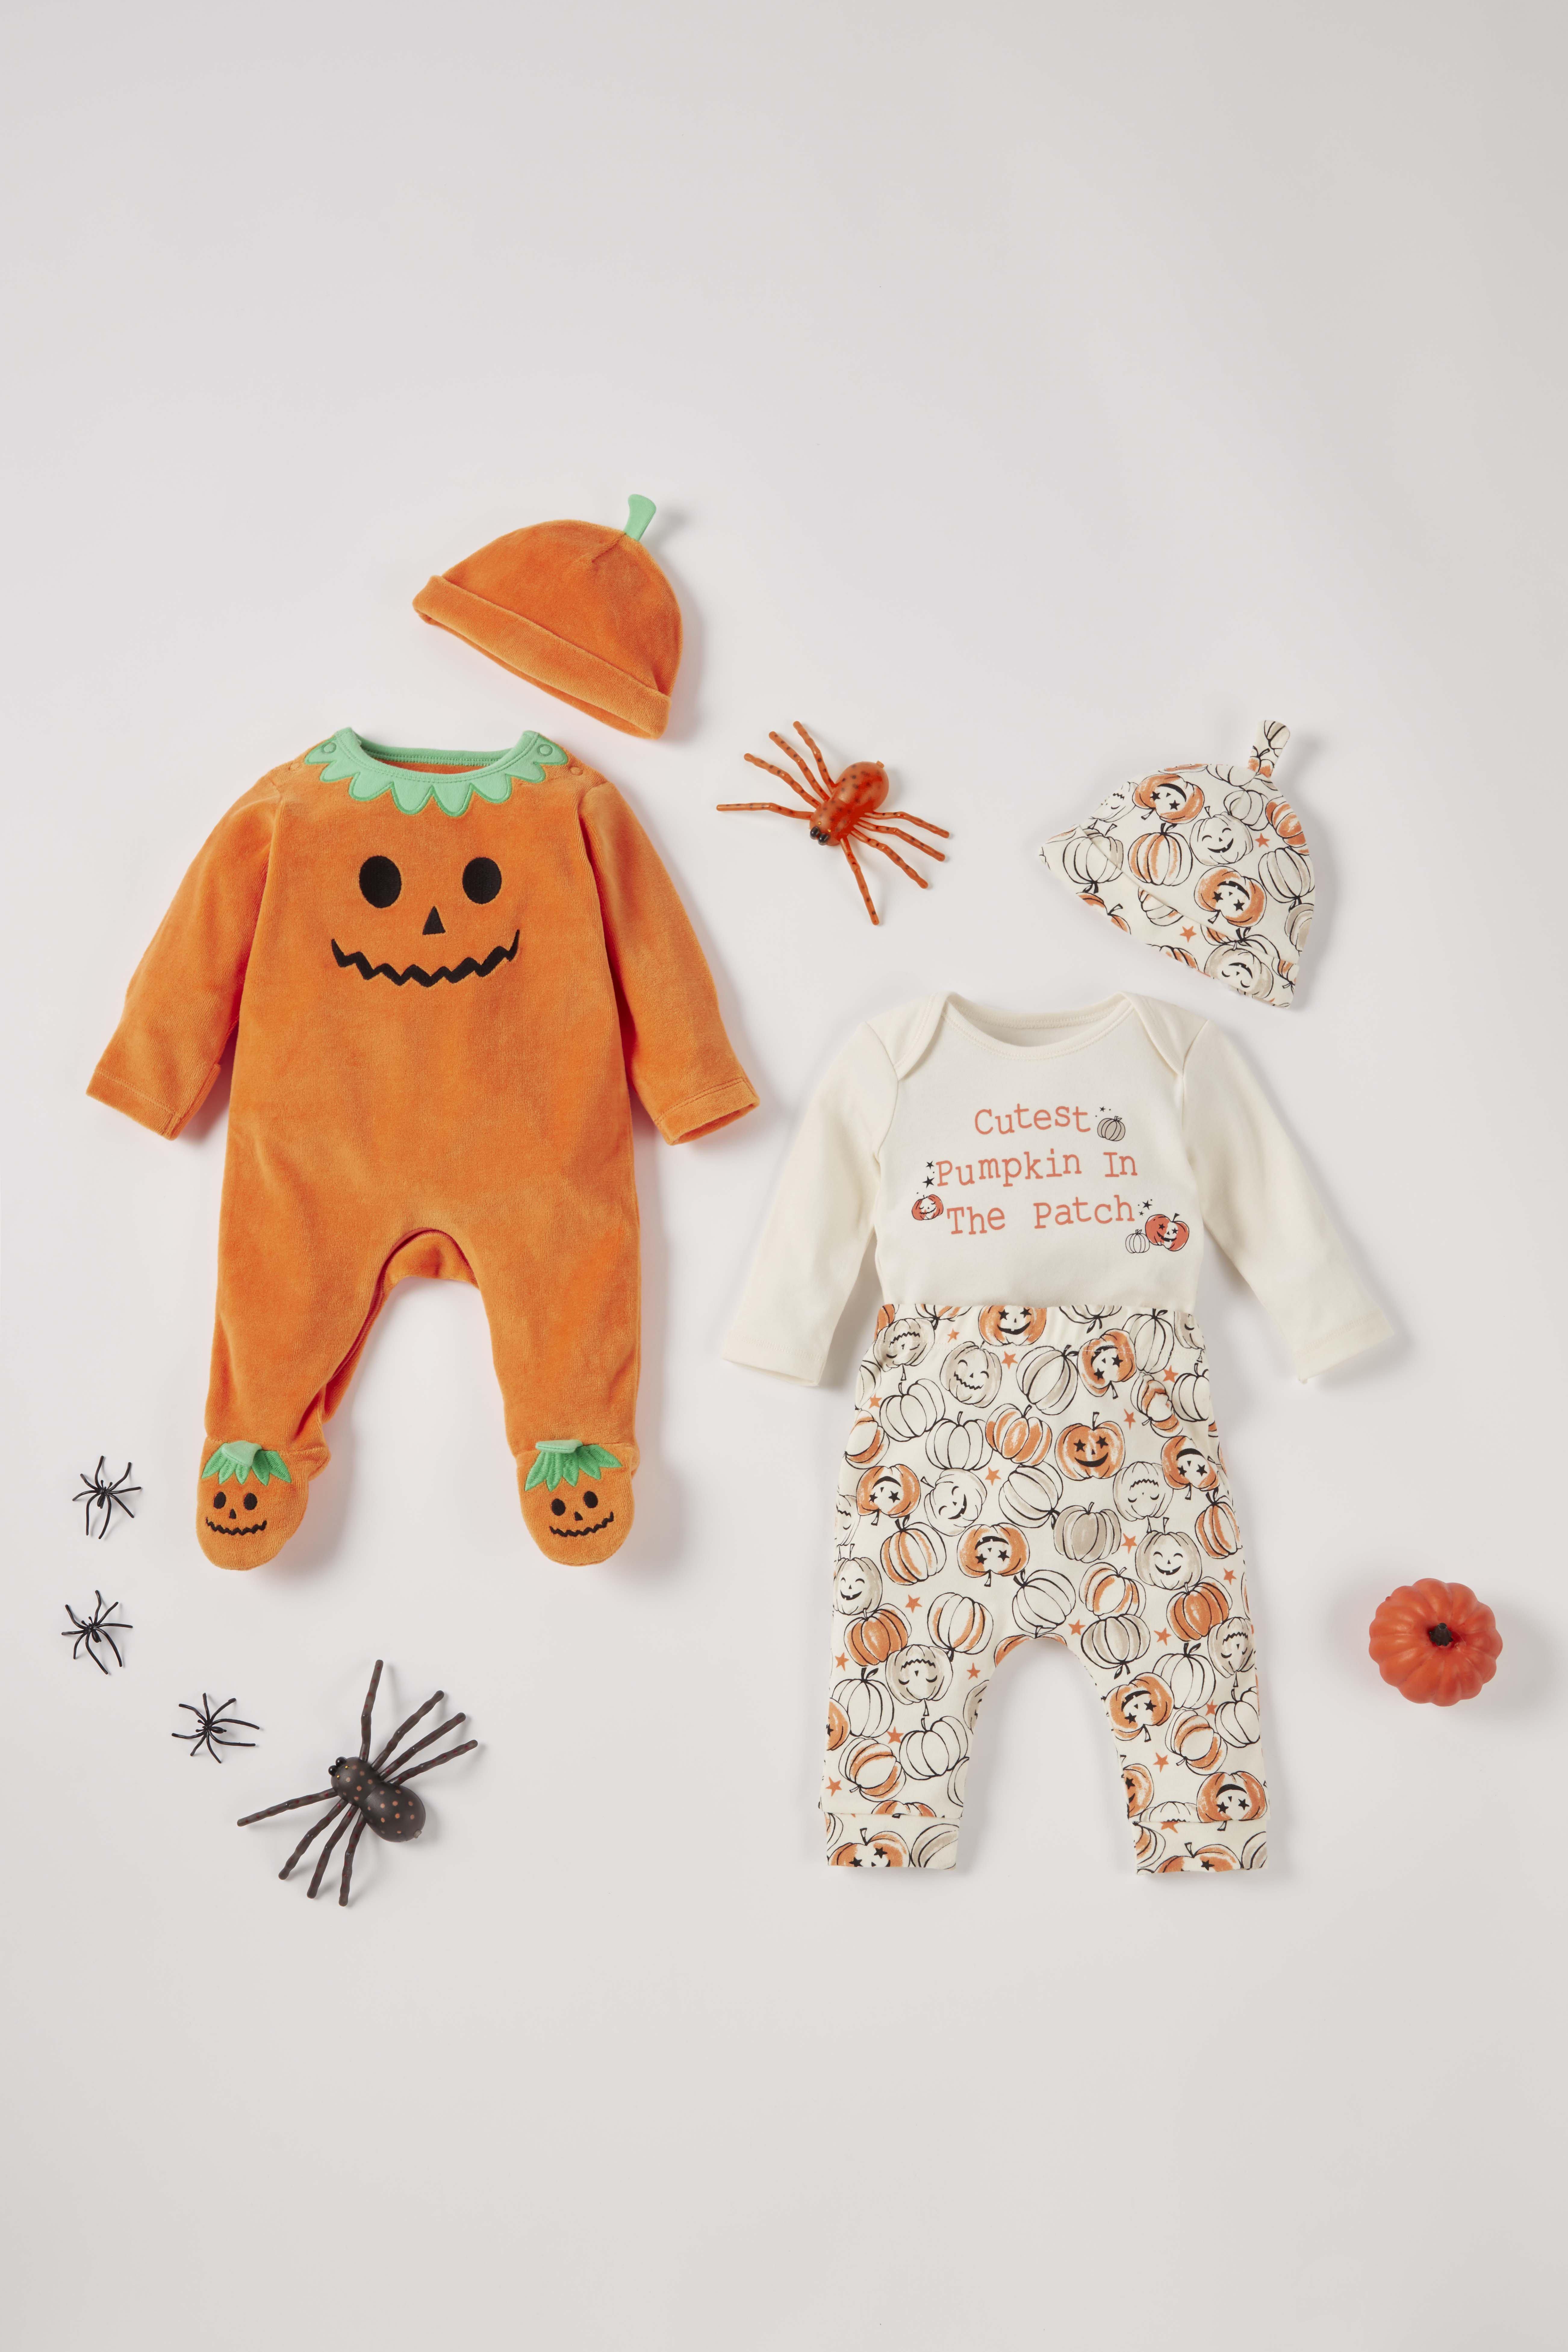 Halloween Treats for the Whole Family